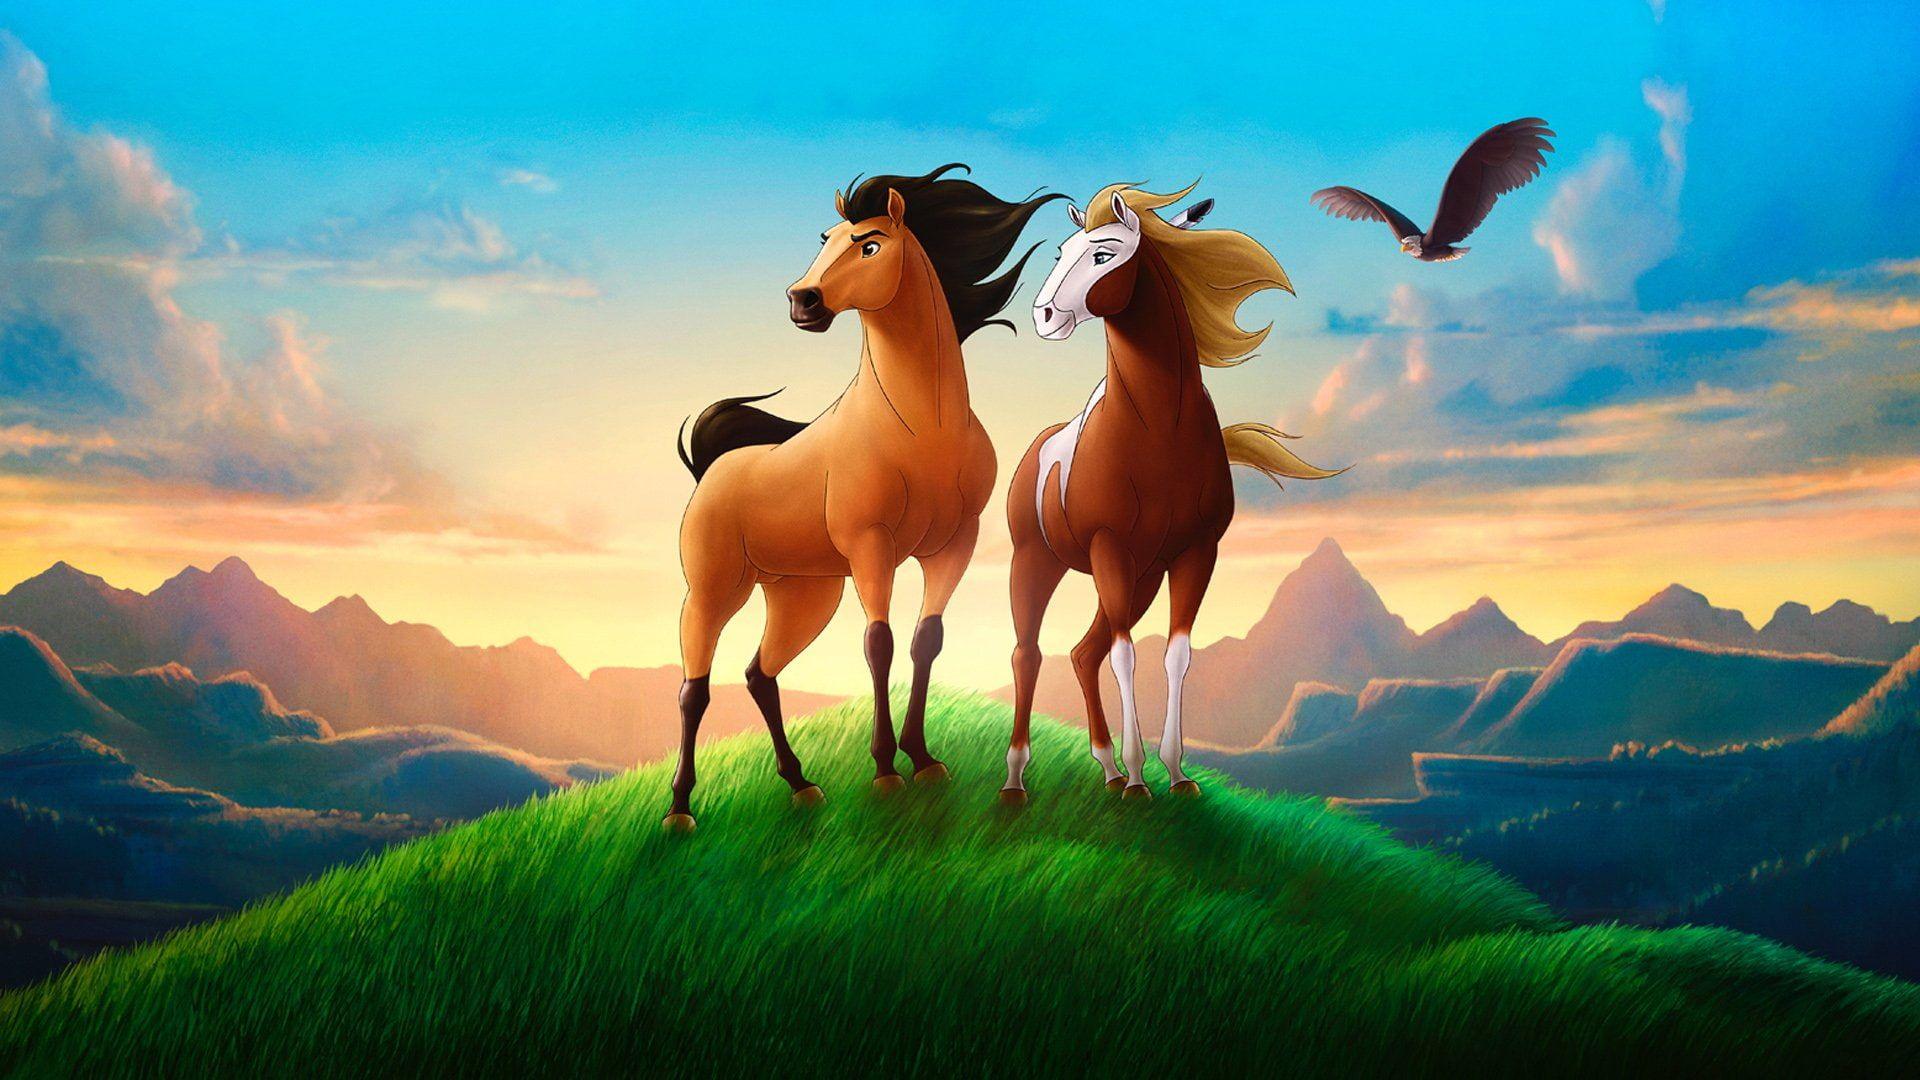 Movie Spirit Stallion Of The Cimarron 1080p Wallpaper Hdwallpaper Desktop In 2020 Spirit The Horse Spirit And Rain Horse Movies